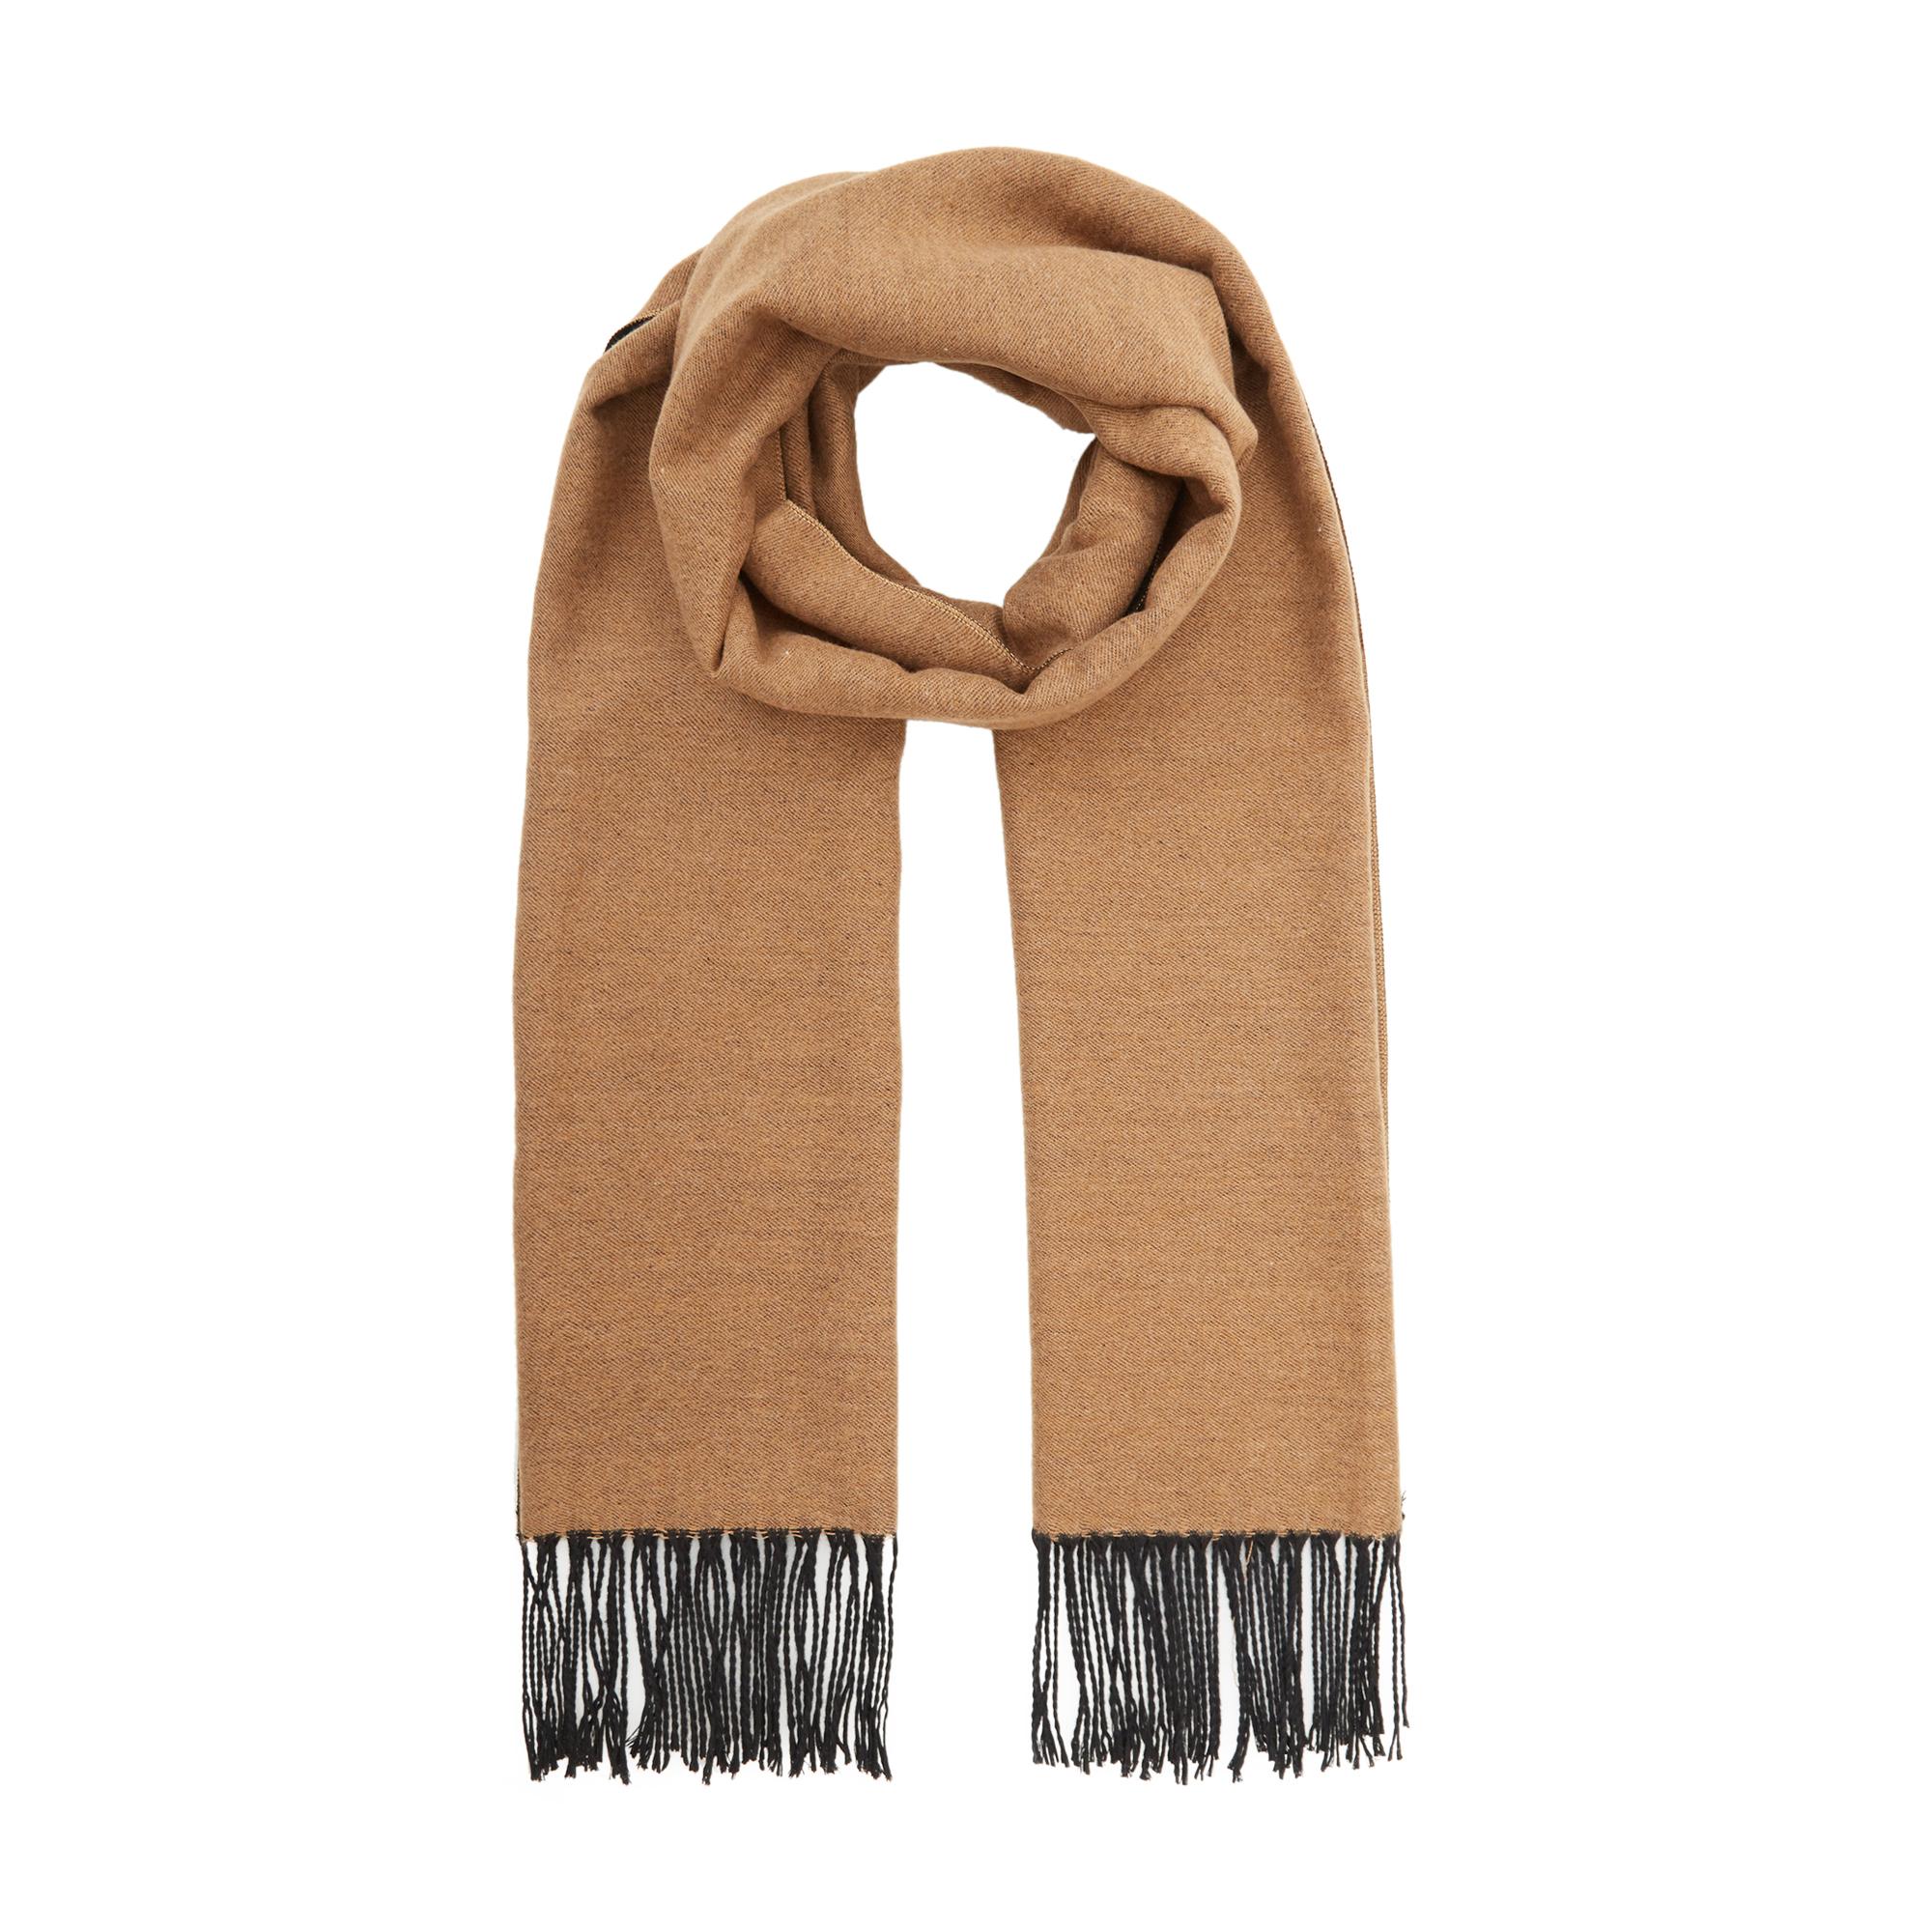 Licha, £30, Dune London